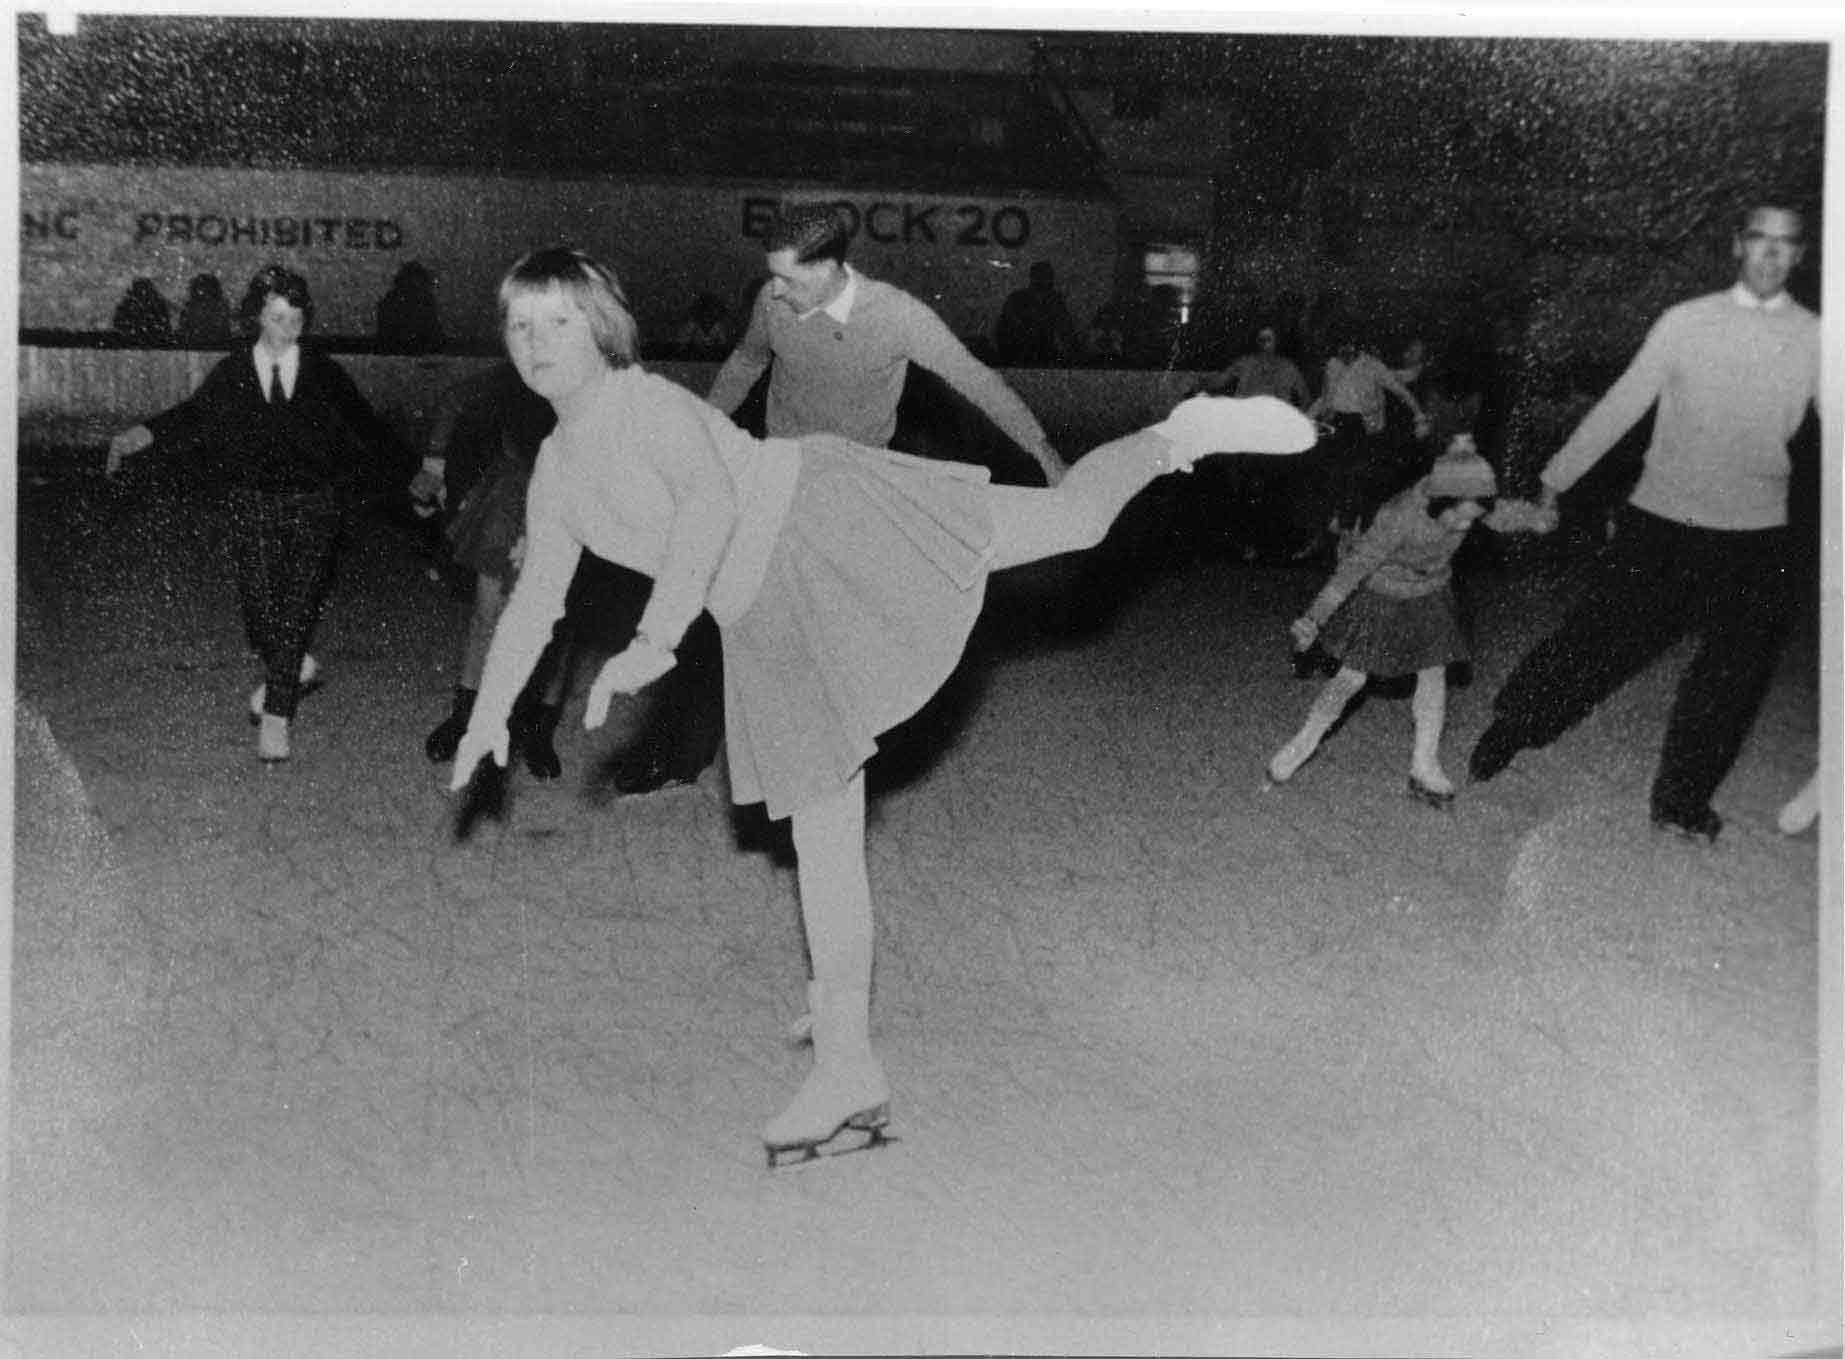 Skating At Murrayfield Ice Rink 1958